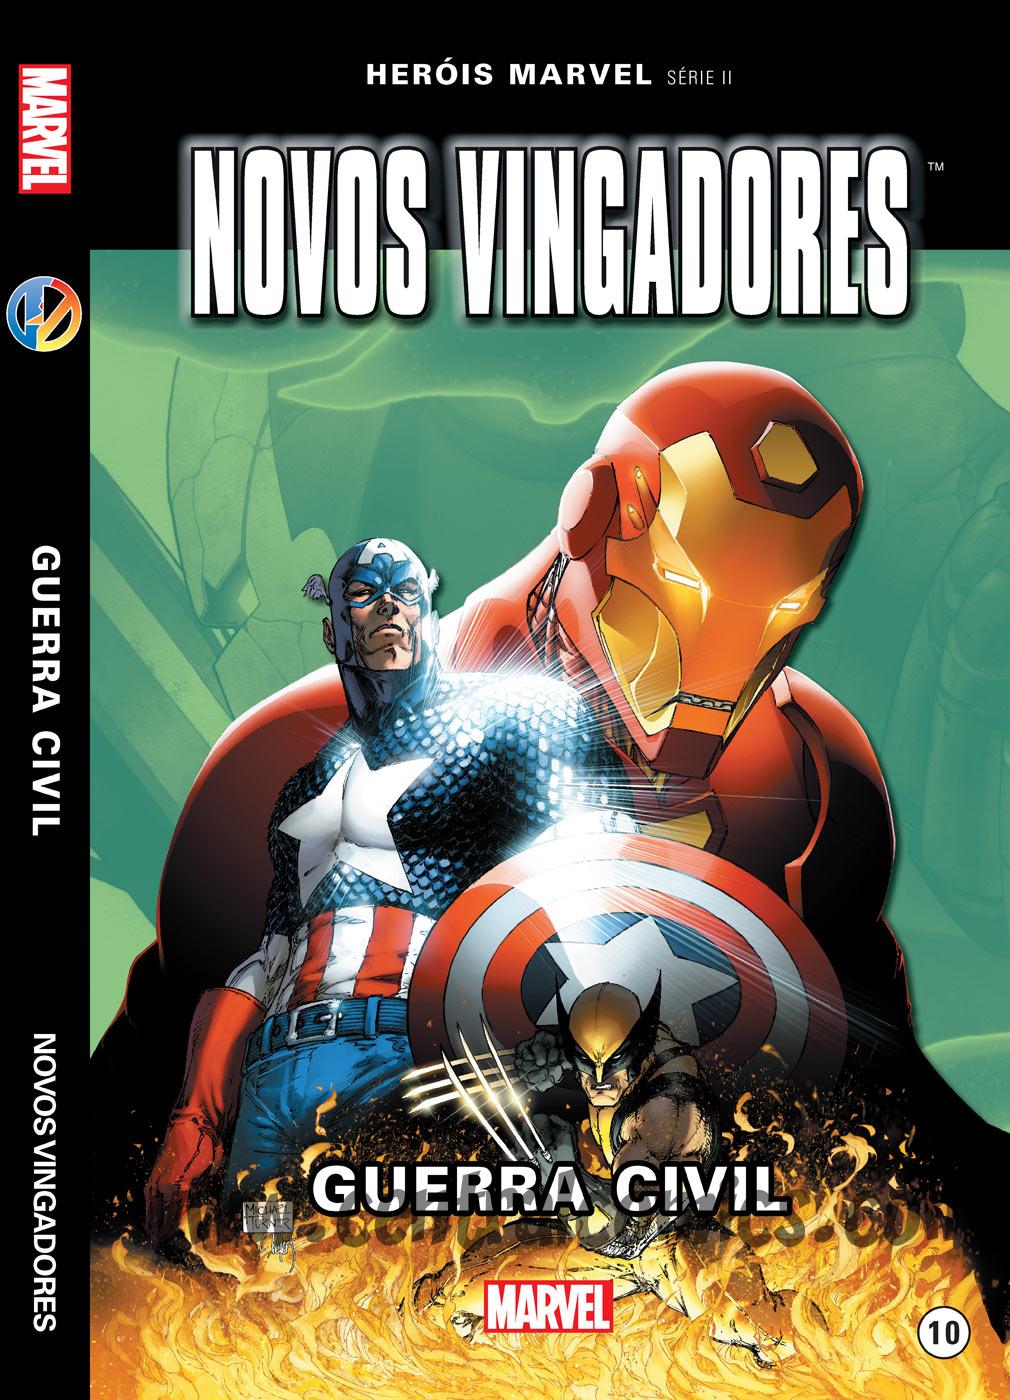 Novos Vingadores Guerra Civil capa